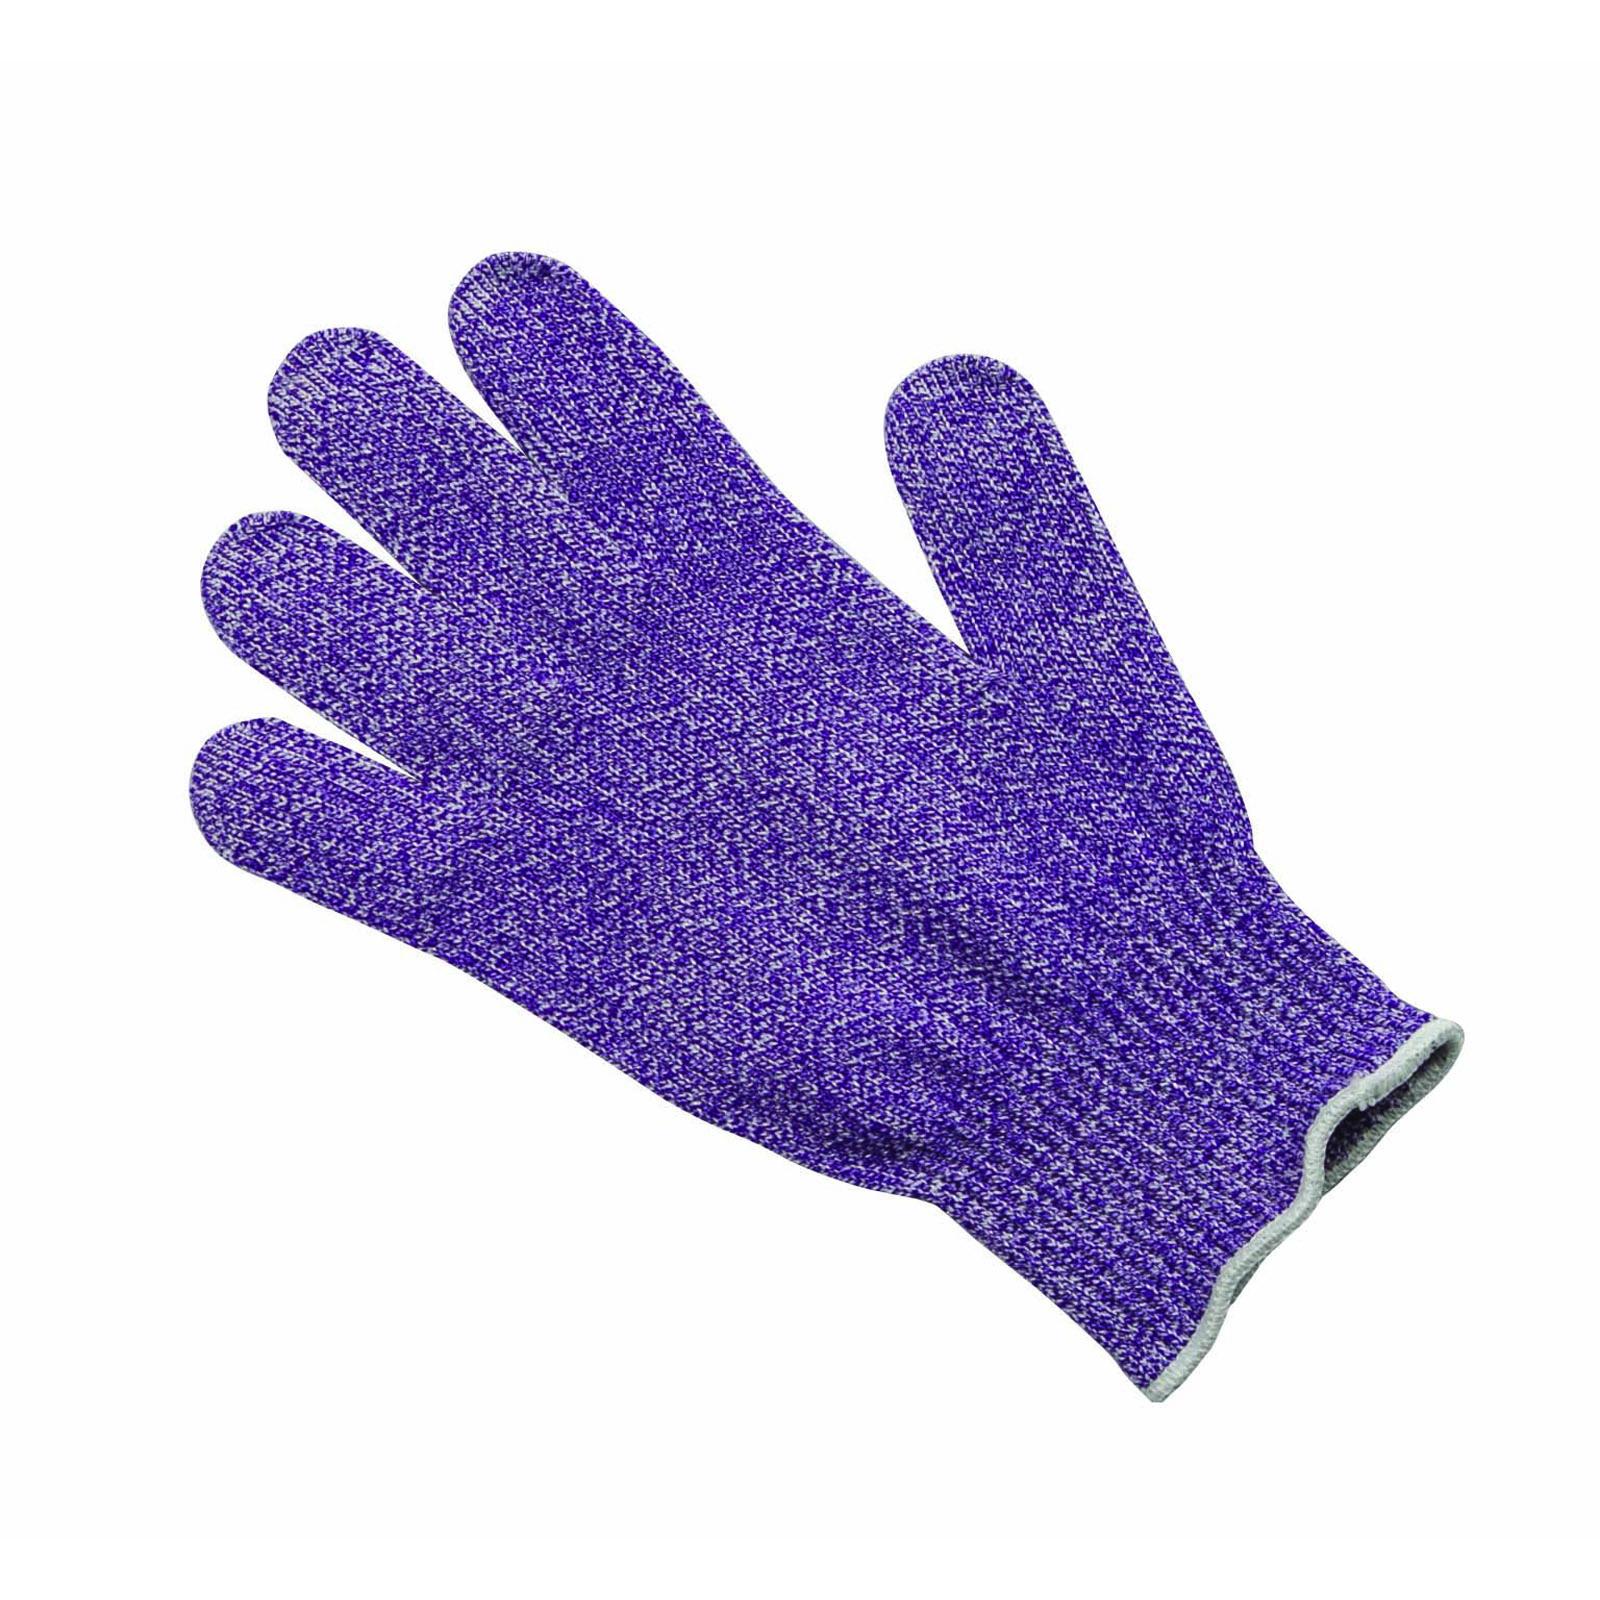 San Jamar SG10-PR-L glove, cut resistant